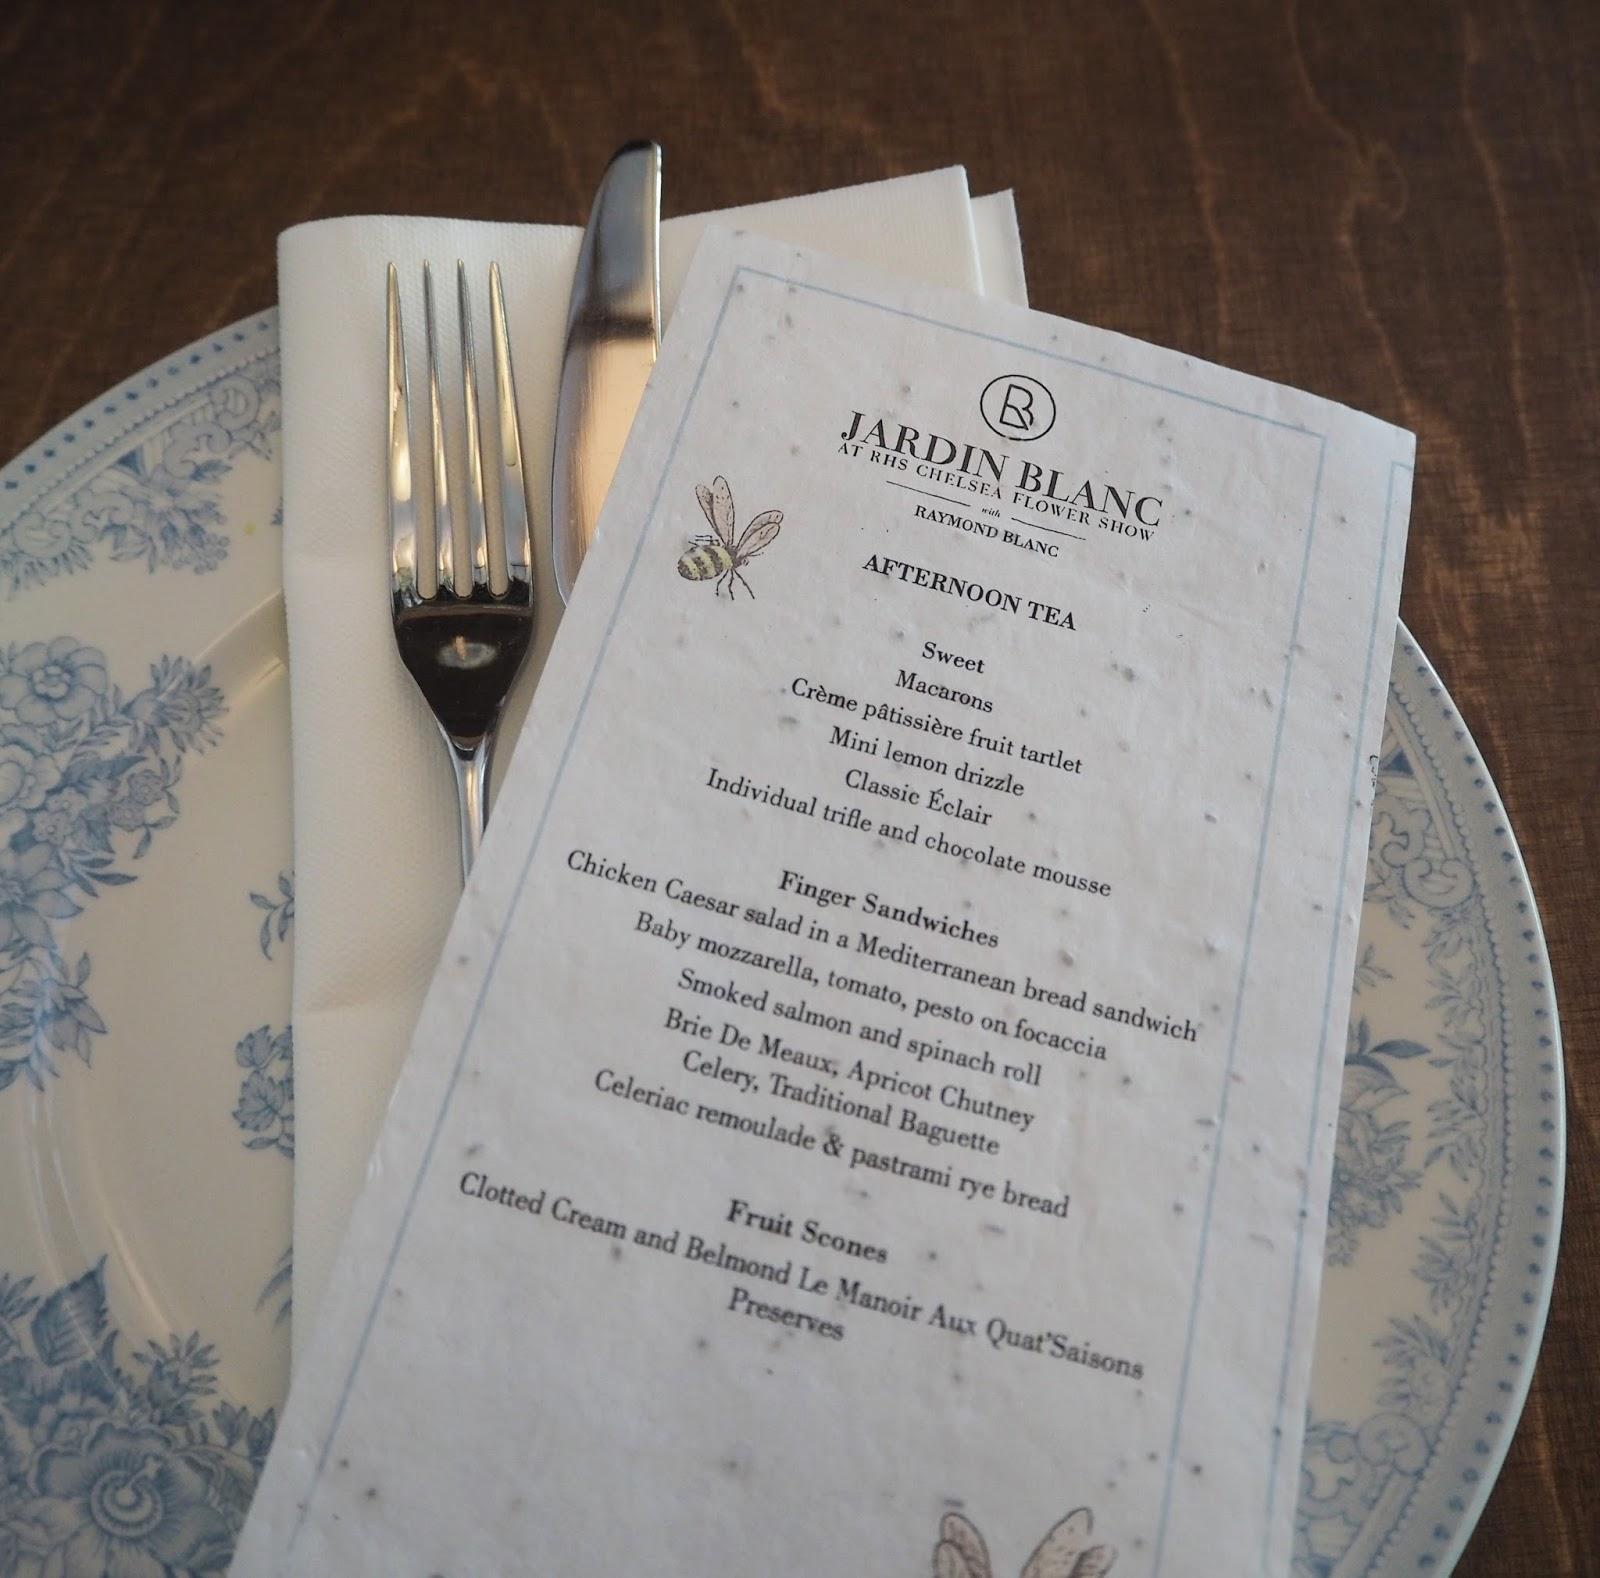 Afternoon tea menu, Jardin Blanc, Chelsea Flower Show 2017